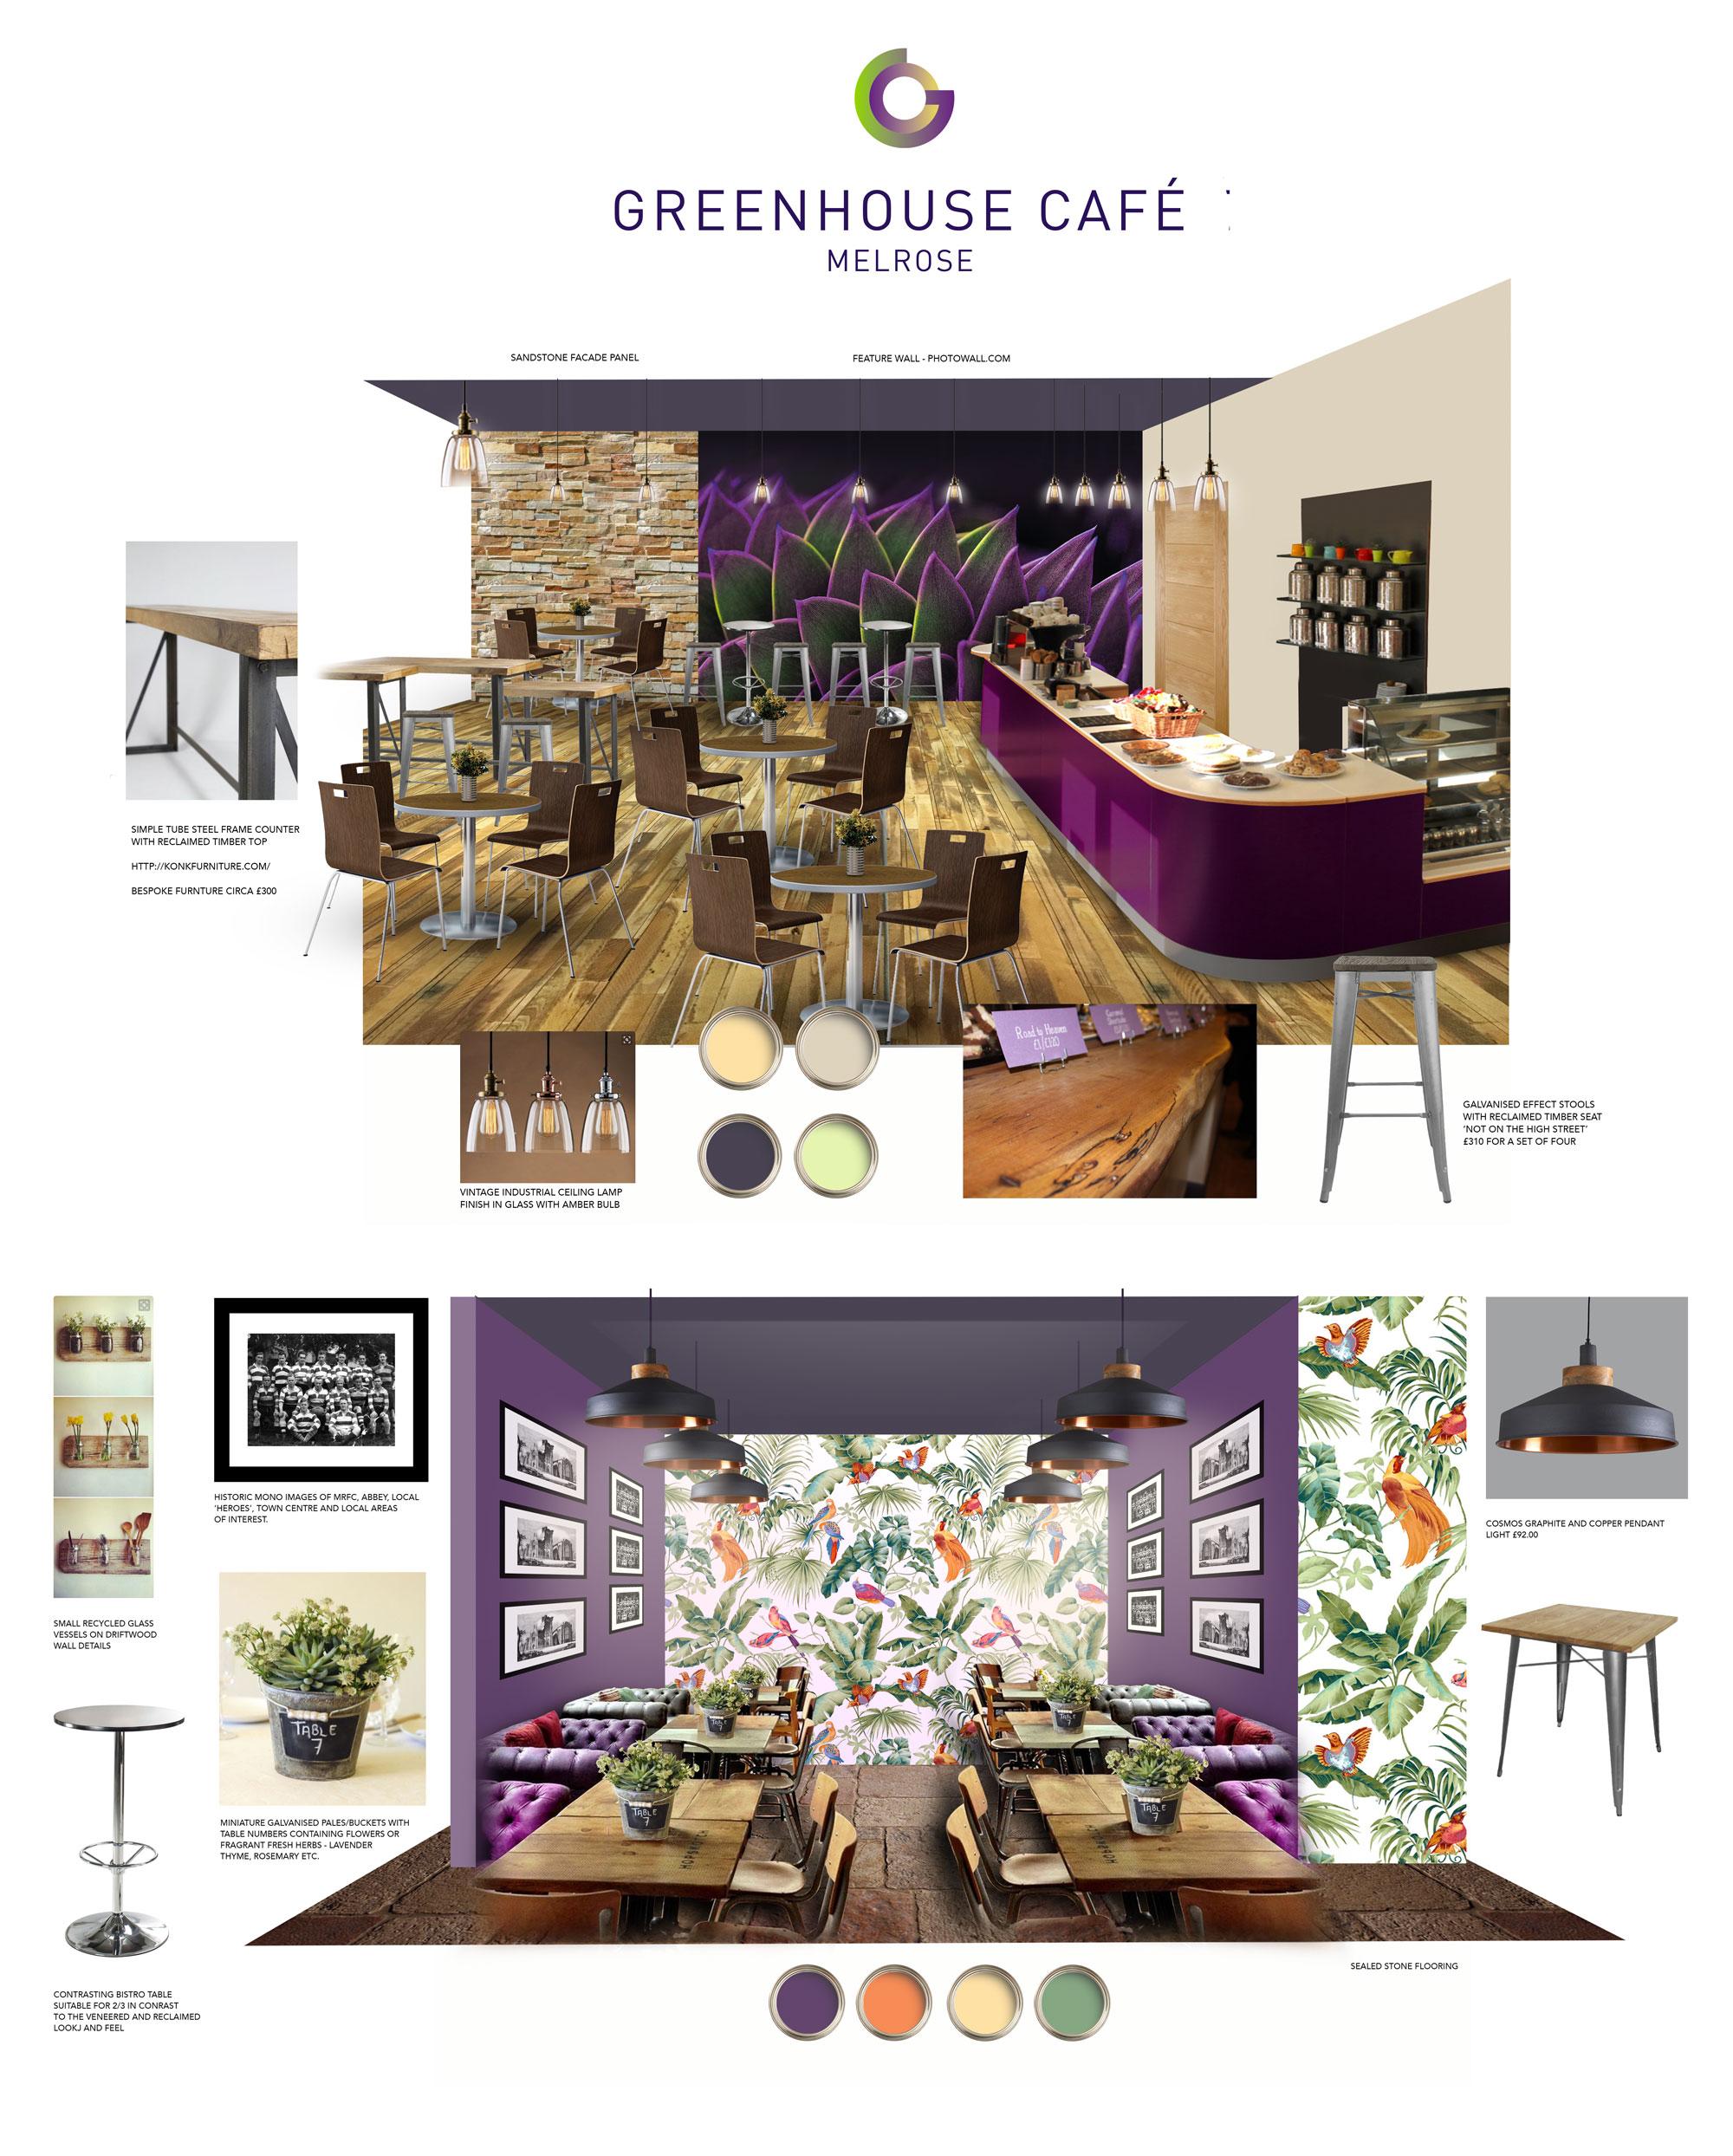 John Hamlin Greenhouse Cafe Melrose Interior Design